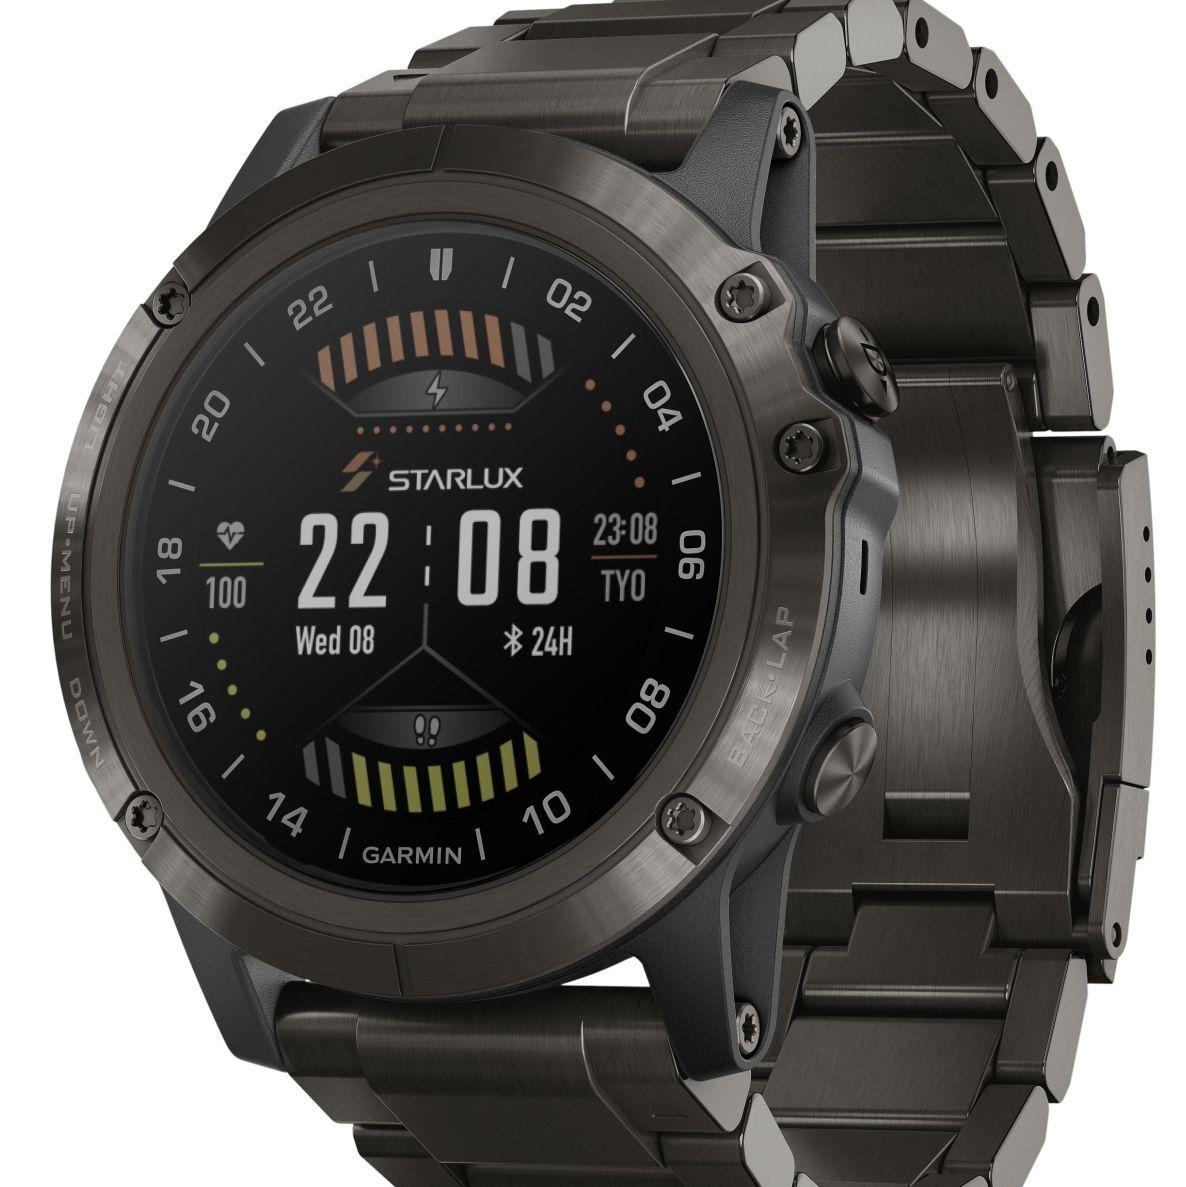 Garmin 為 STARLUX 星宇航空打造專屬錶款